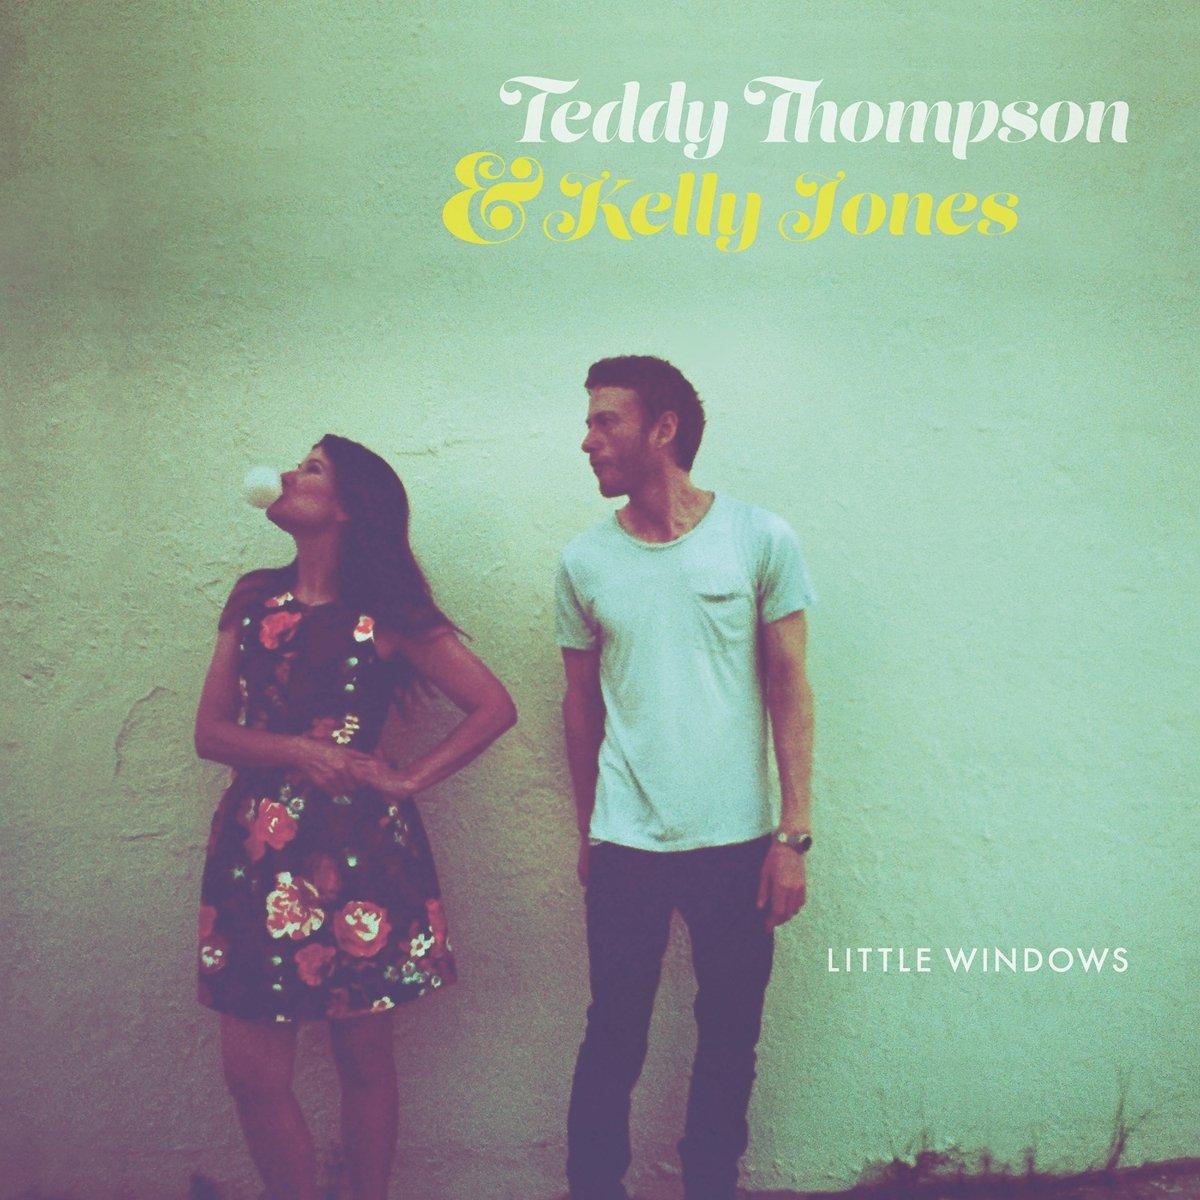 Teddy Thompson and Kelly Jones - Little Windows - Amazon.com Music